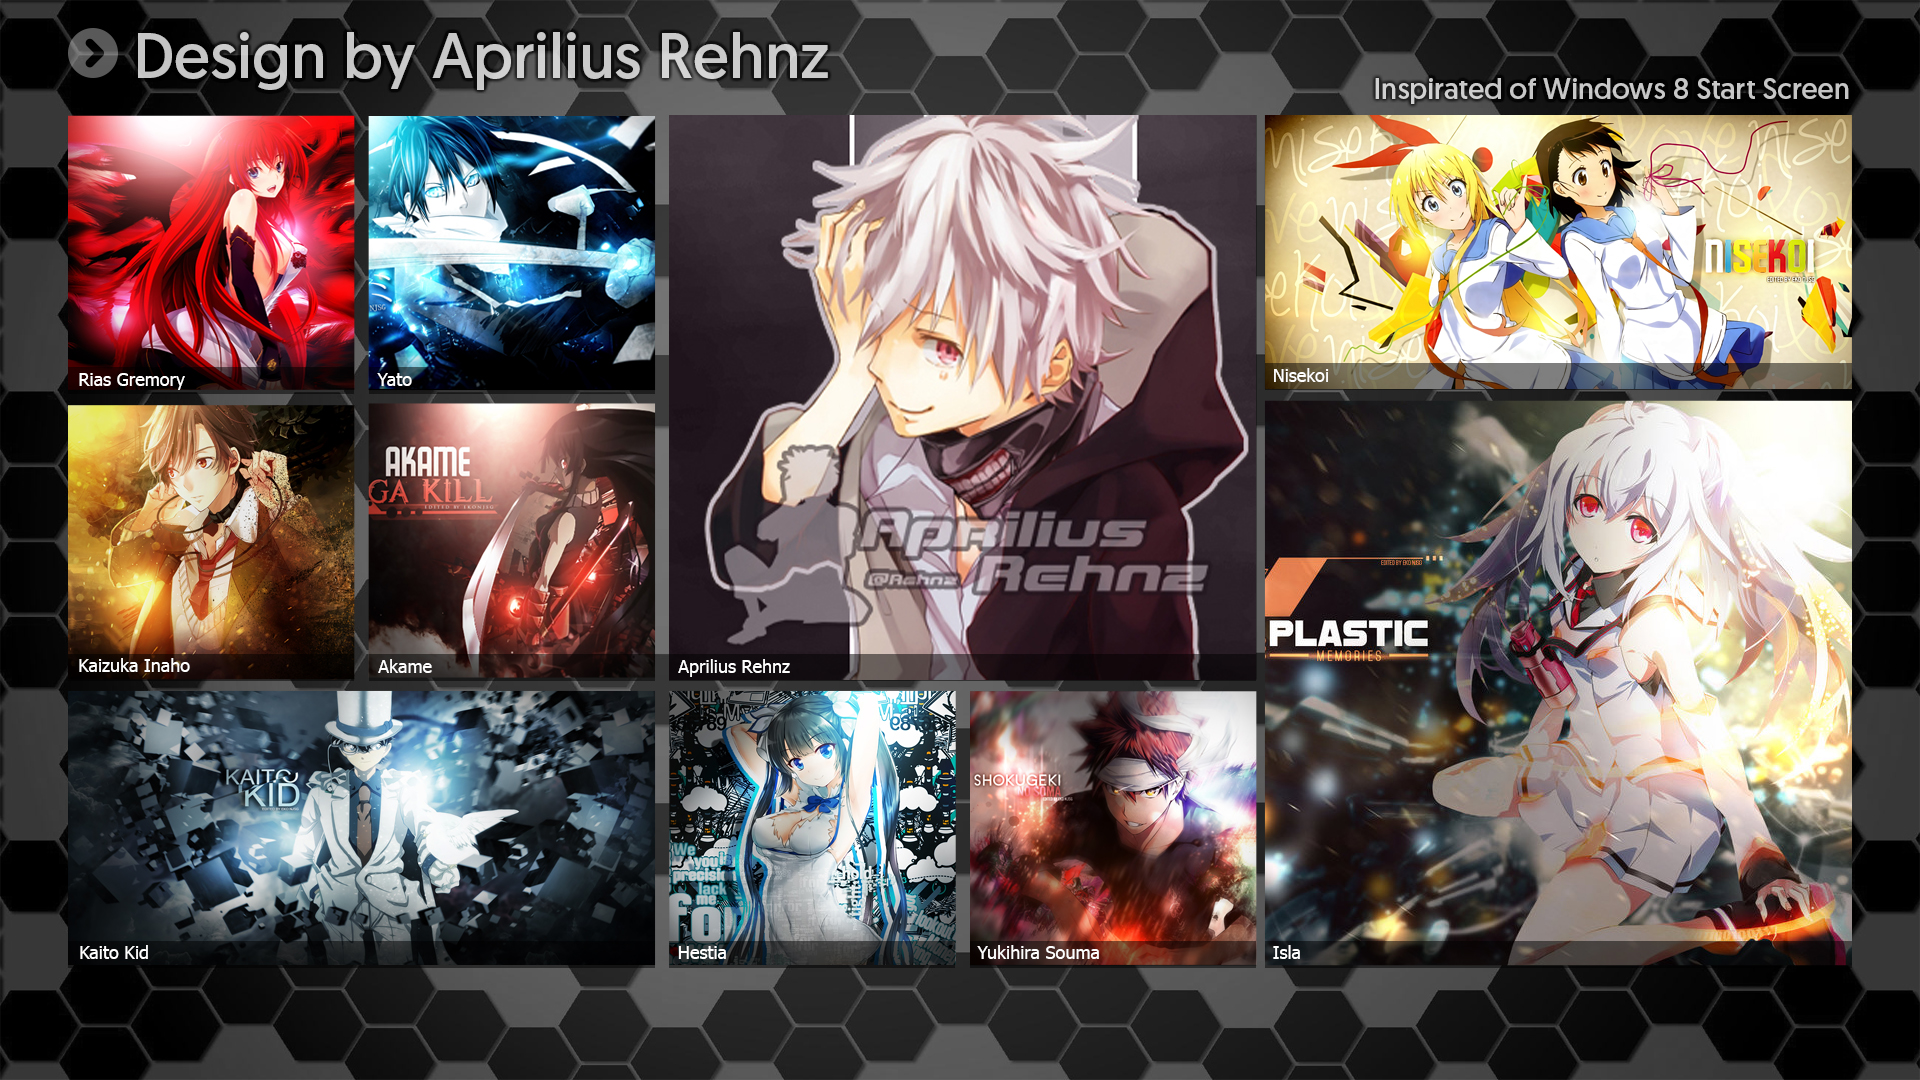 Anime Wallpaper Style Windows 8 Re Design By Apriliusrehnz